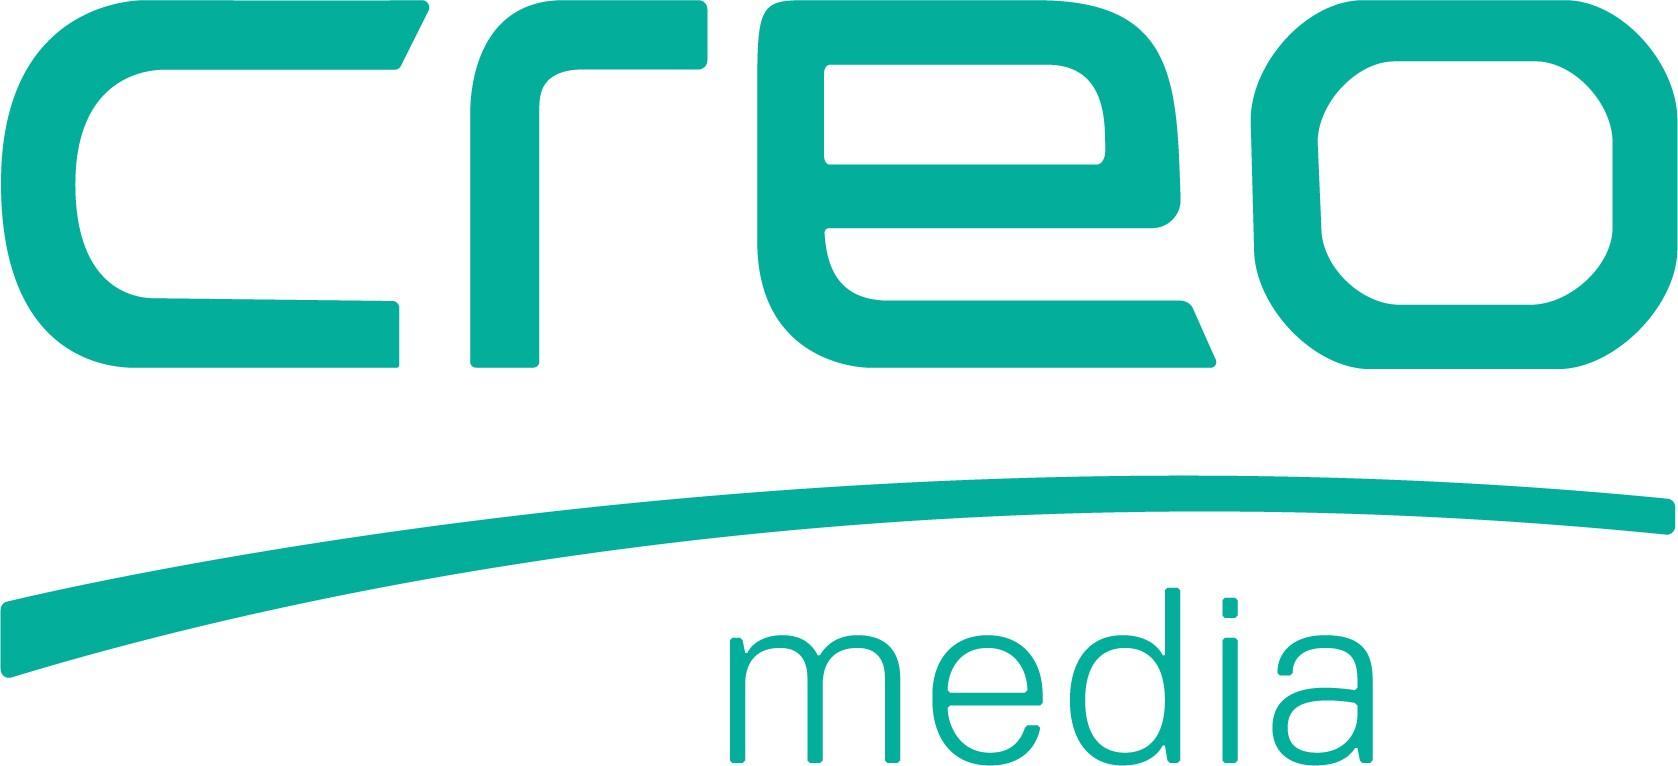 creo-media GmbH